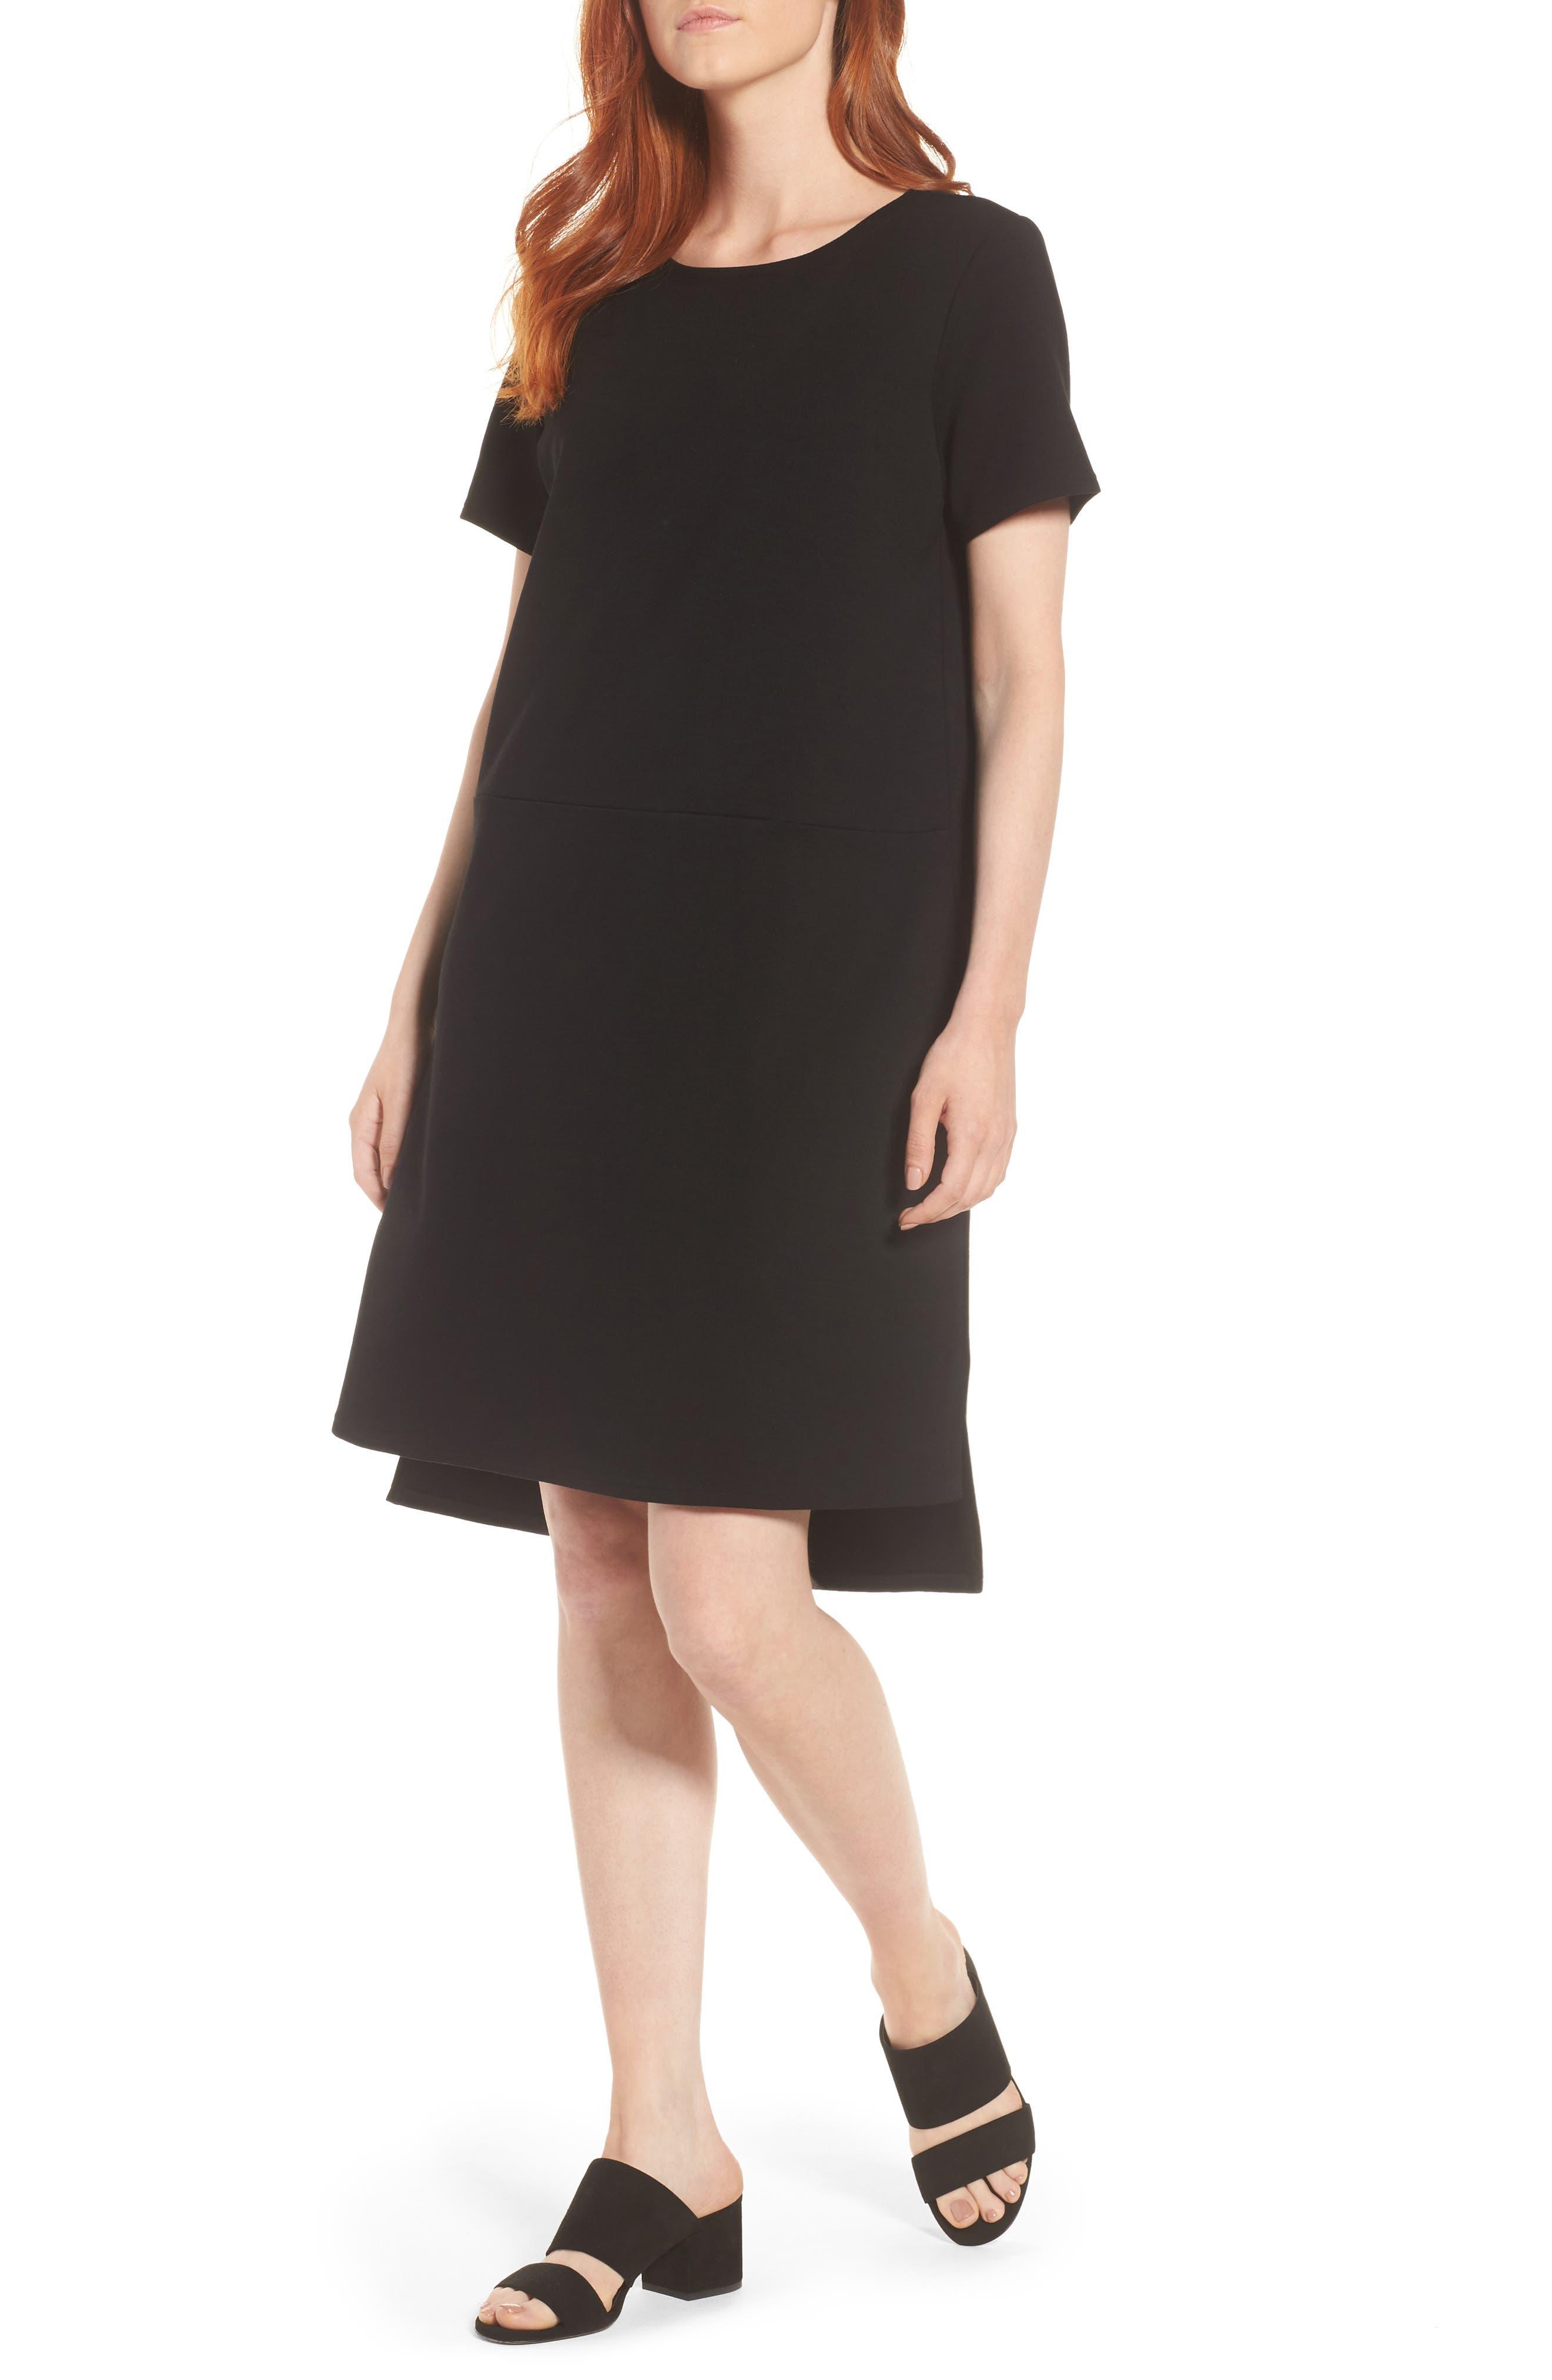 Tencel<sup>®</sup> Lyocell Blend Knit Shift Dress,                             Main thumbnail 1, color,                             Black